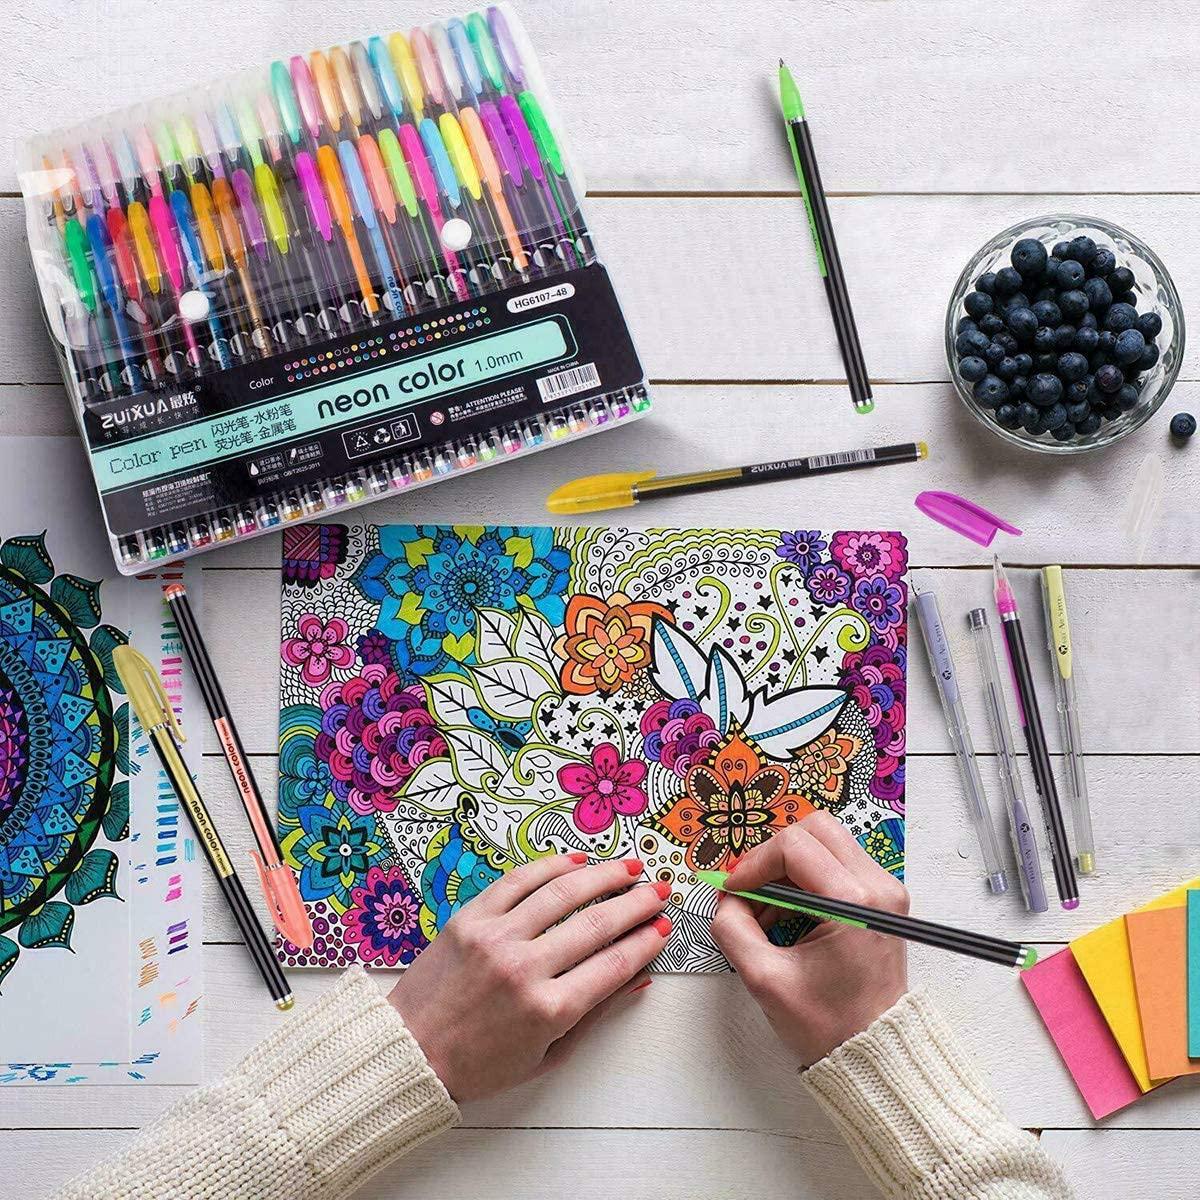 hongxinq hongxinq 48pcs Colors Gel Pens Set Metallic Pastel Glitter Neon Marker Pen